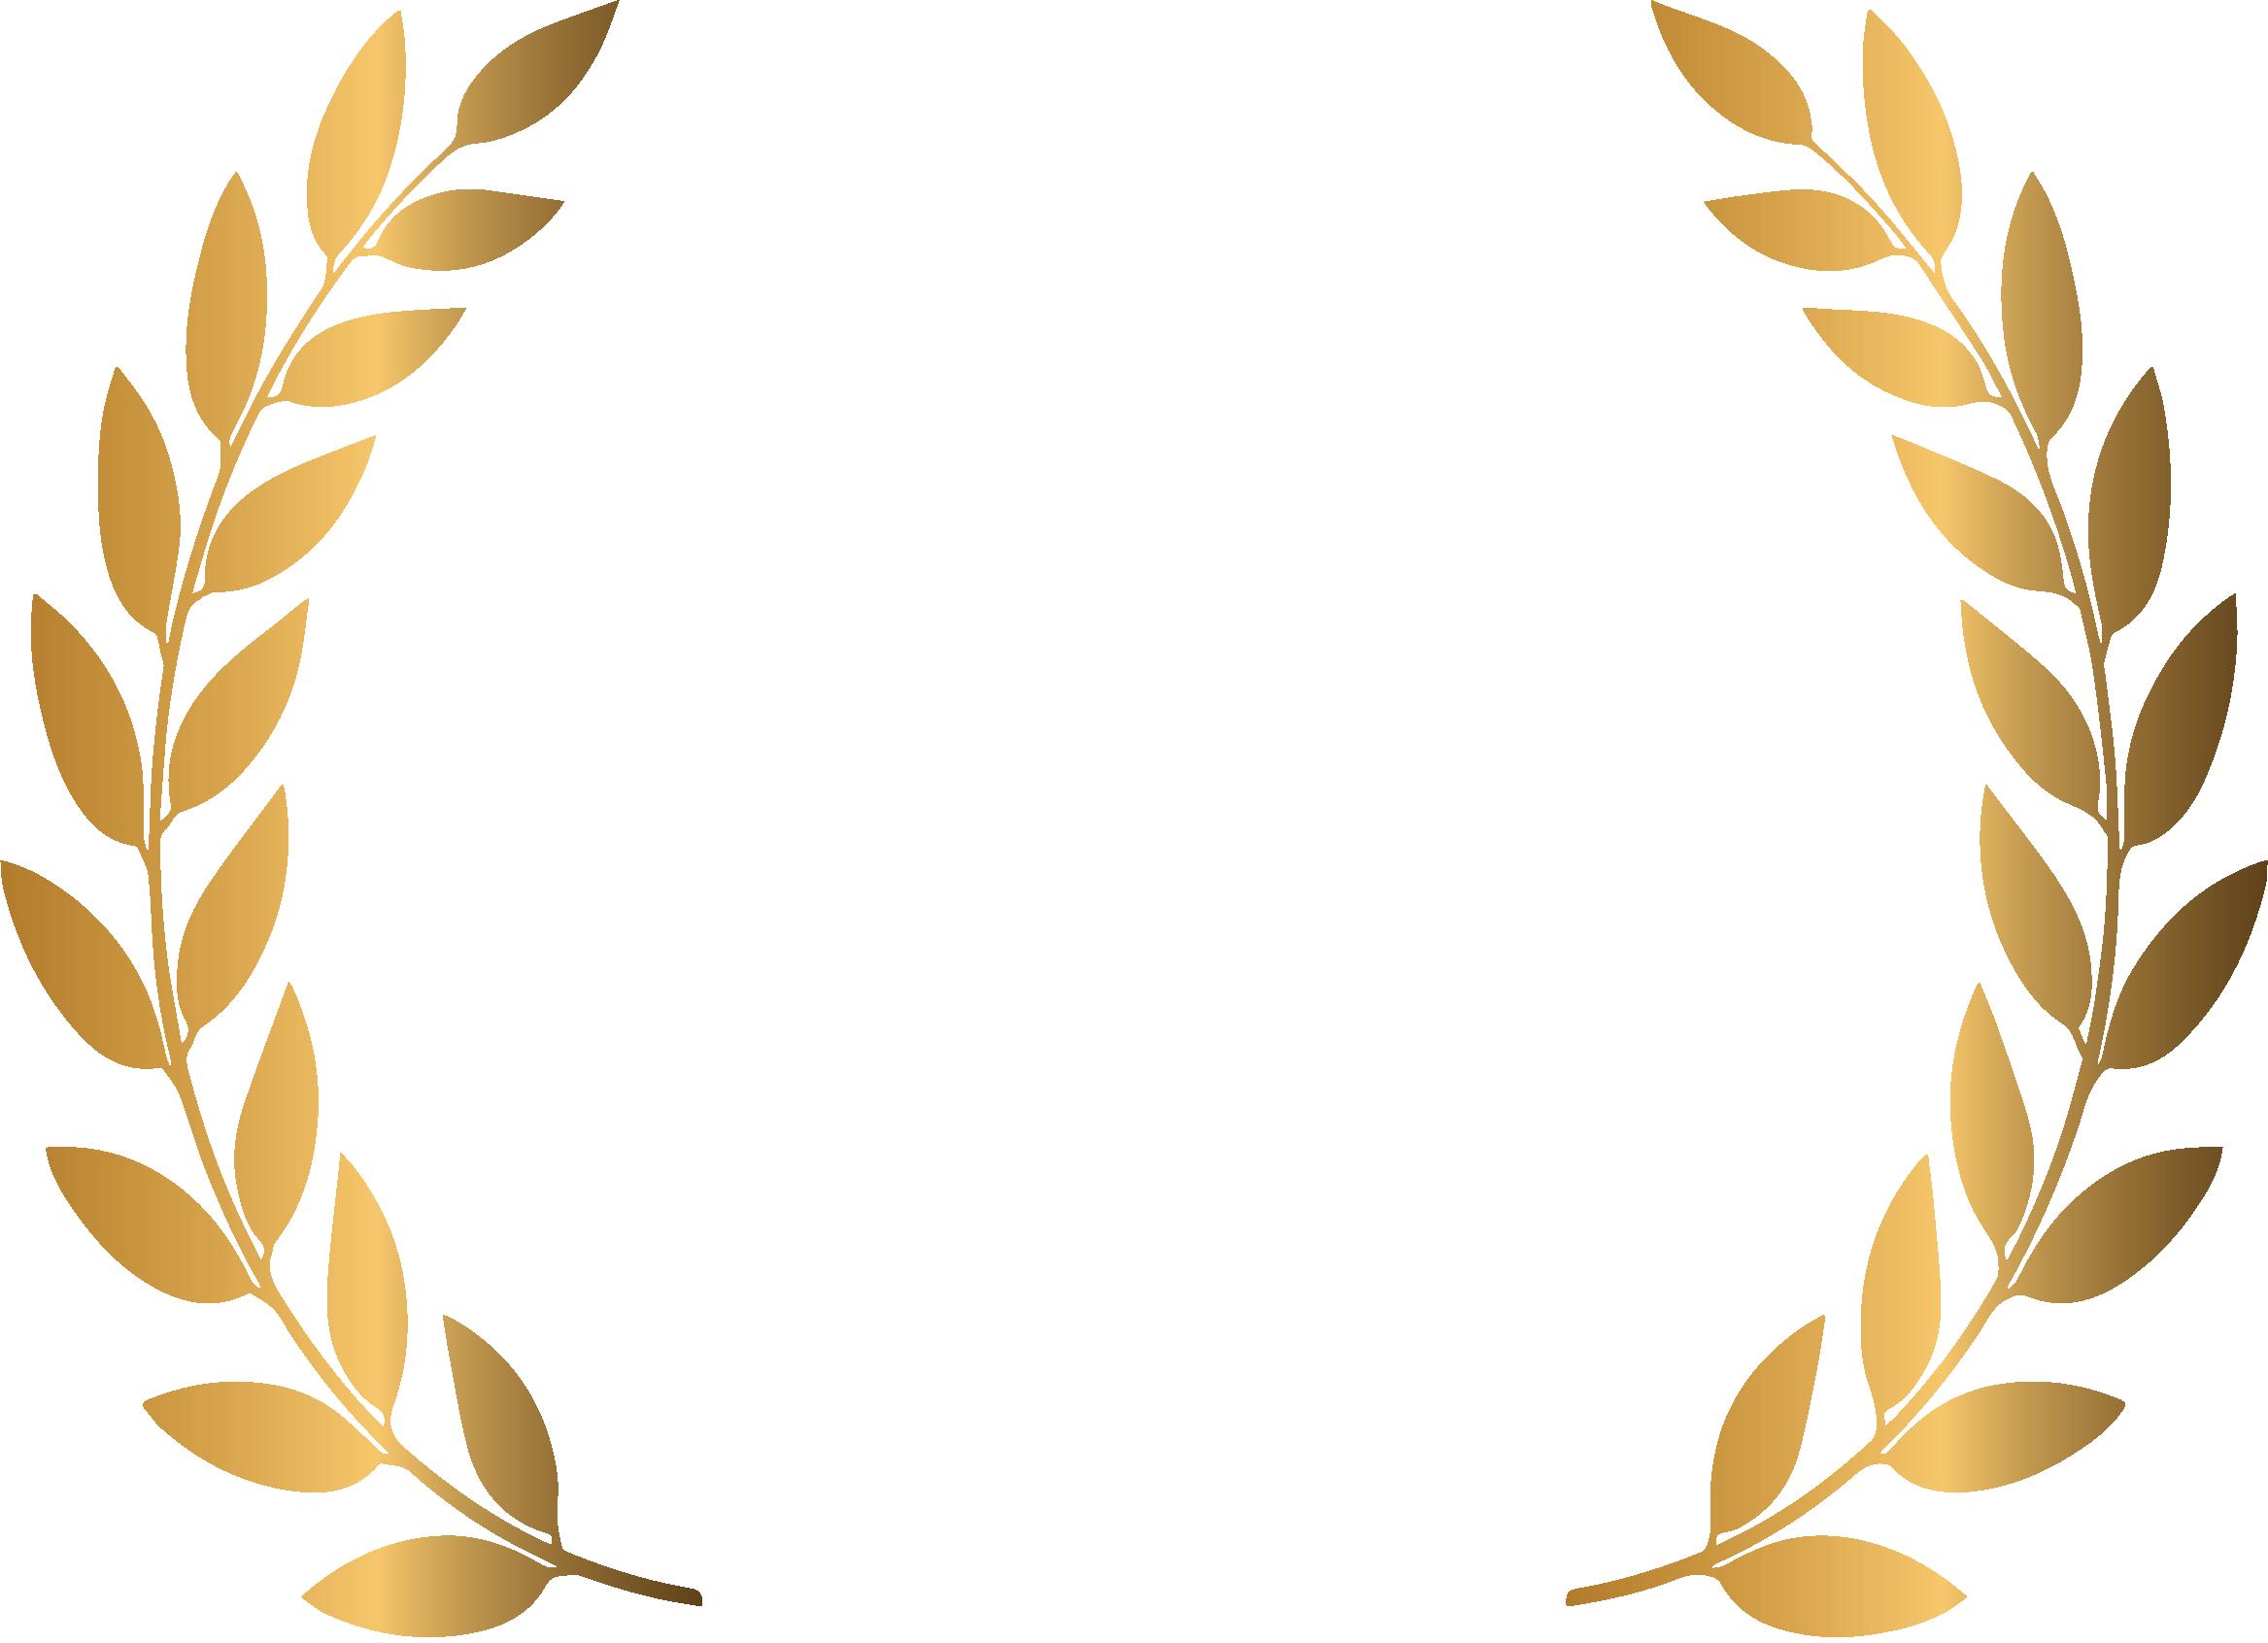 Executive Resume Award of Excellence 2